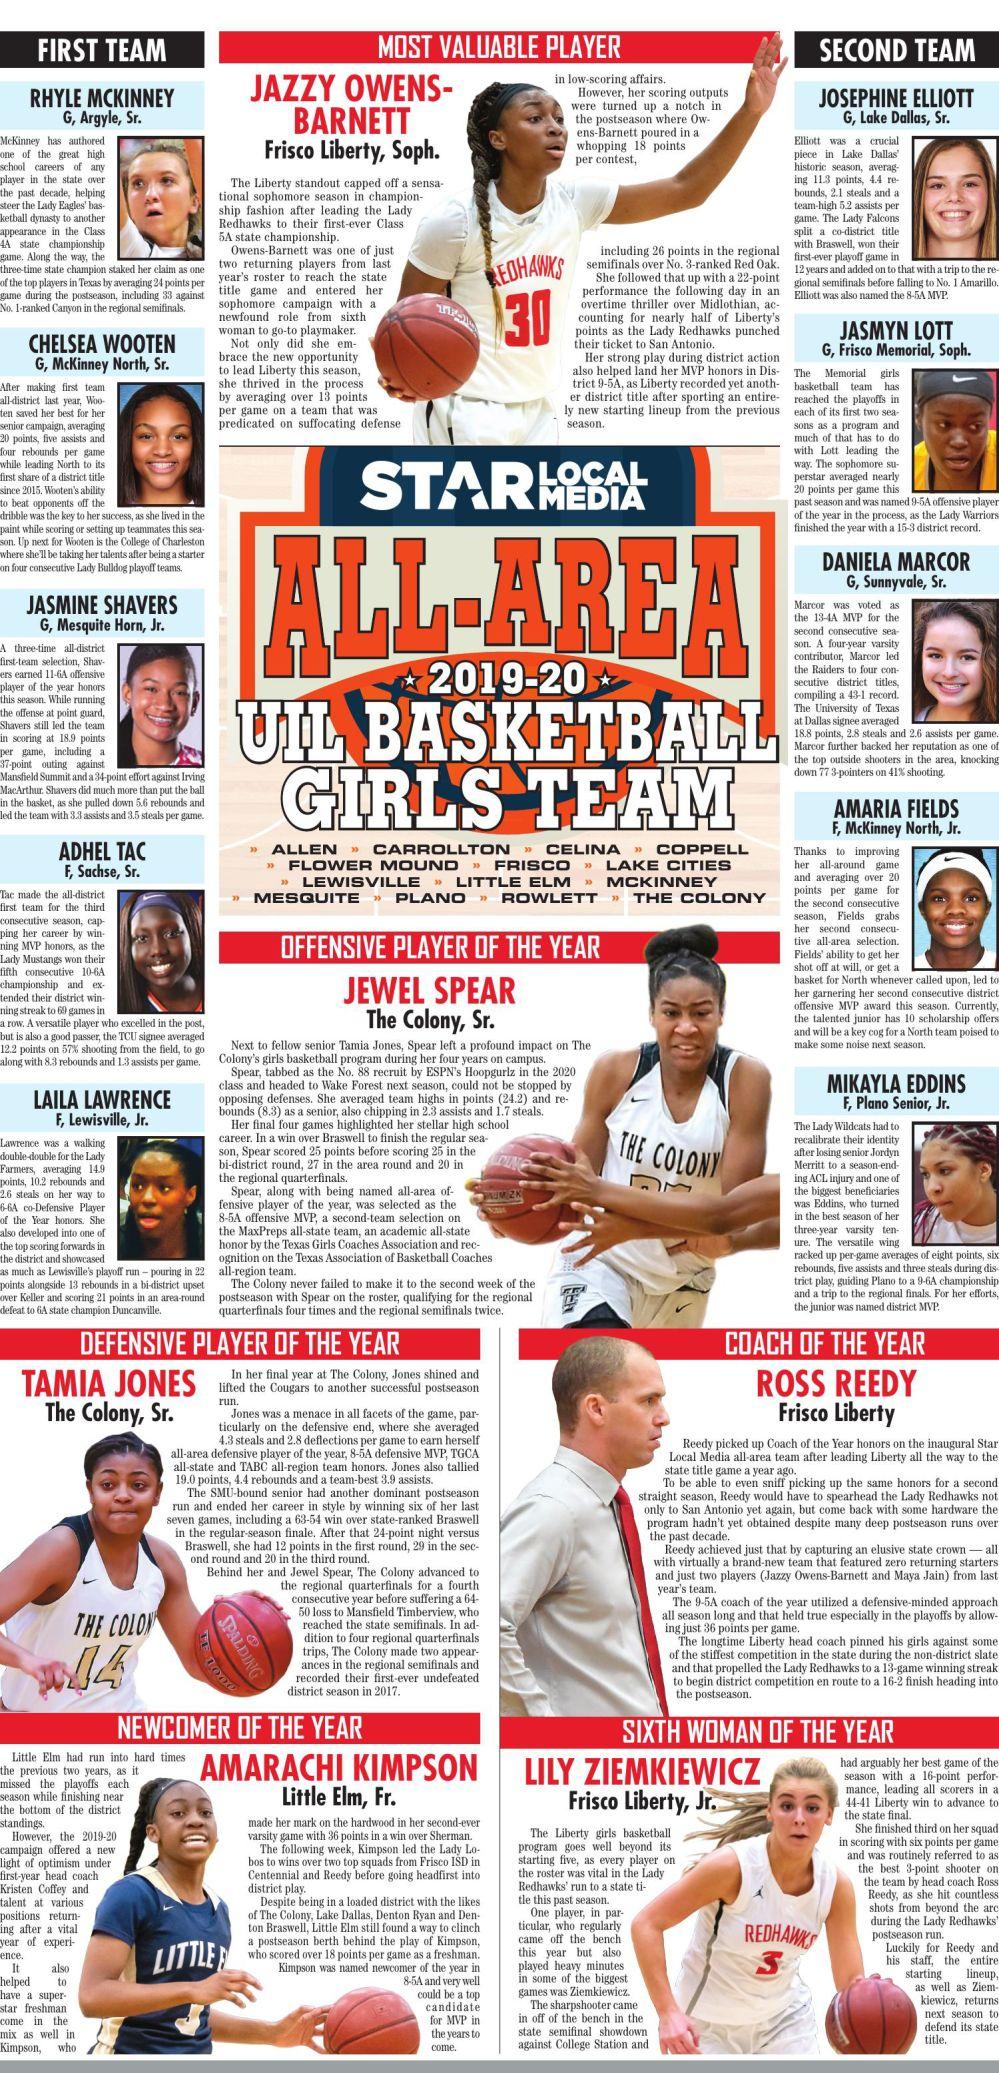 2019-20 Star Local Media All-Area Girls Basketball Team